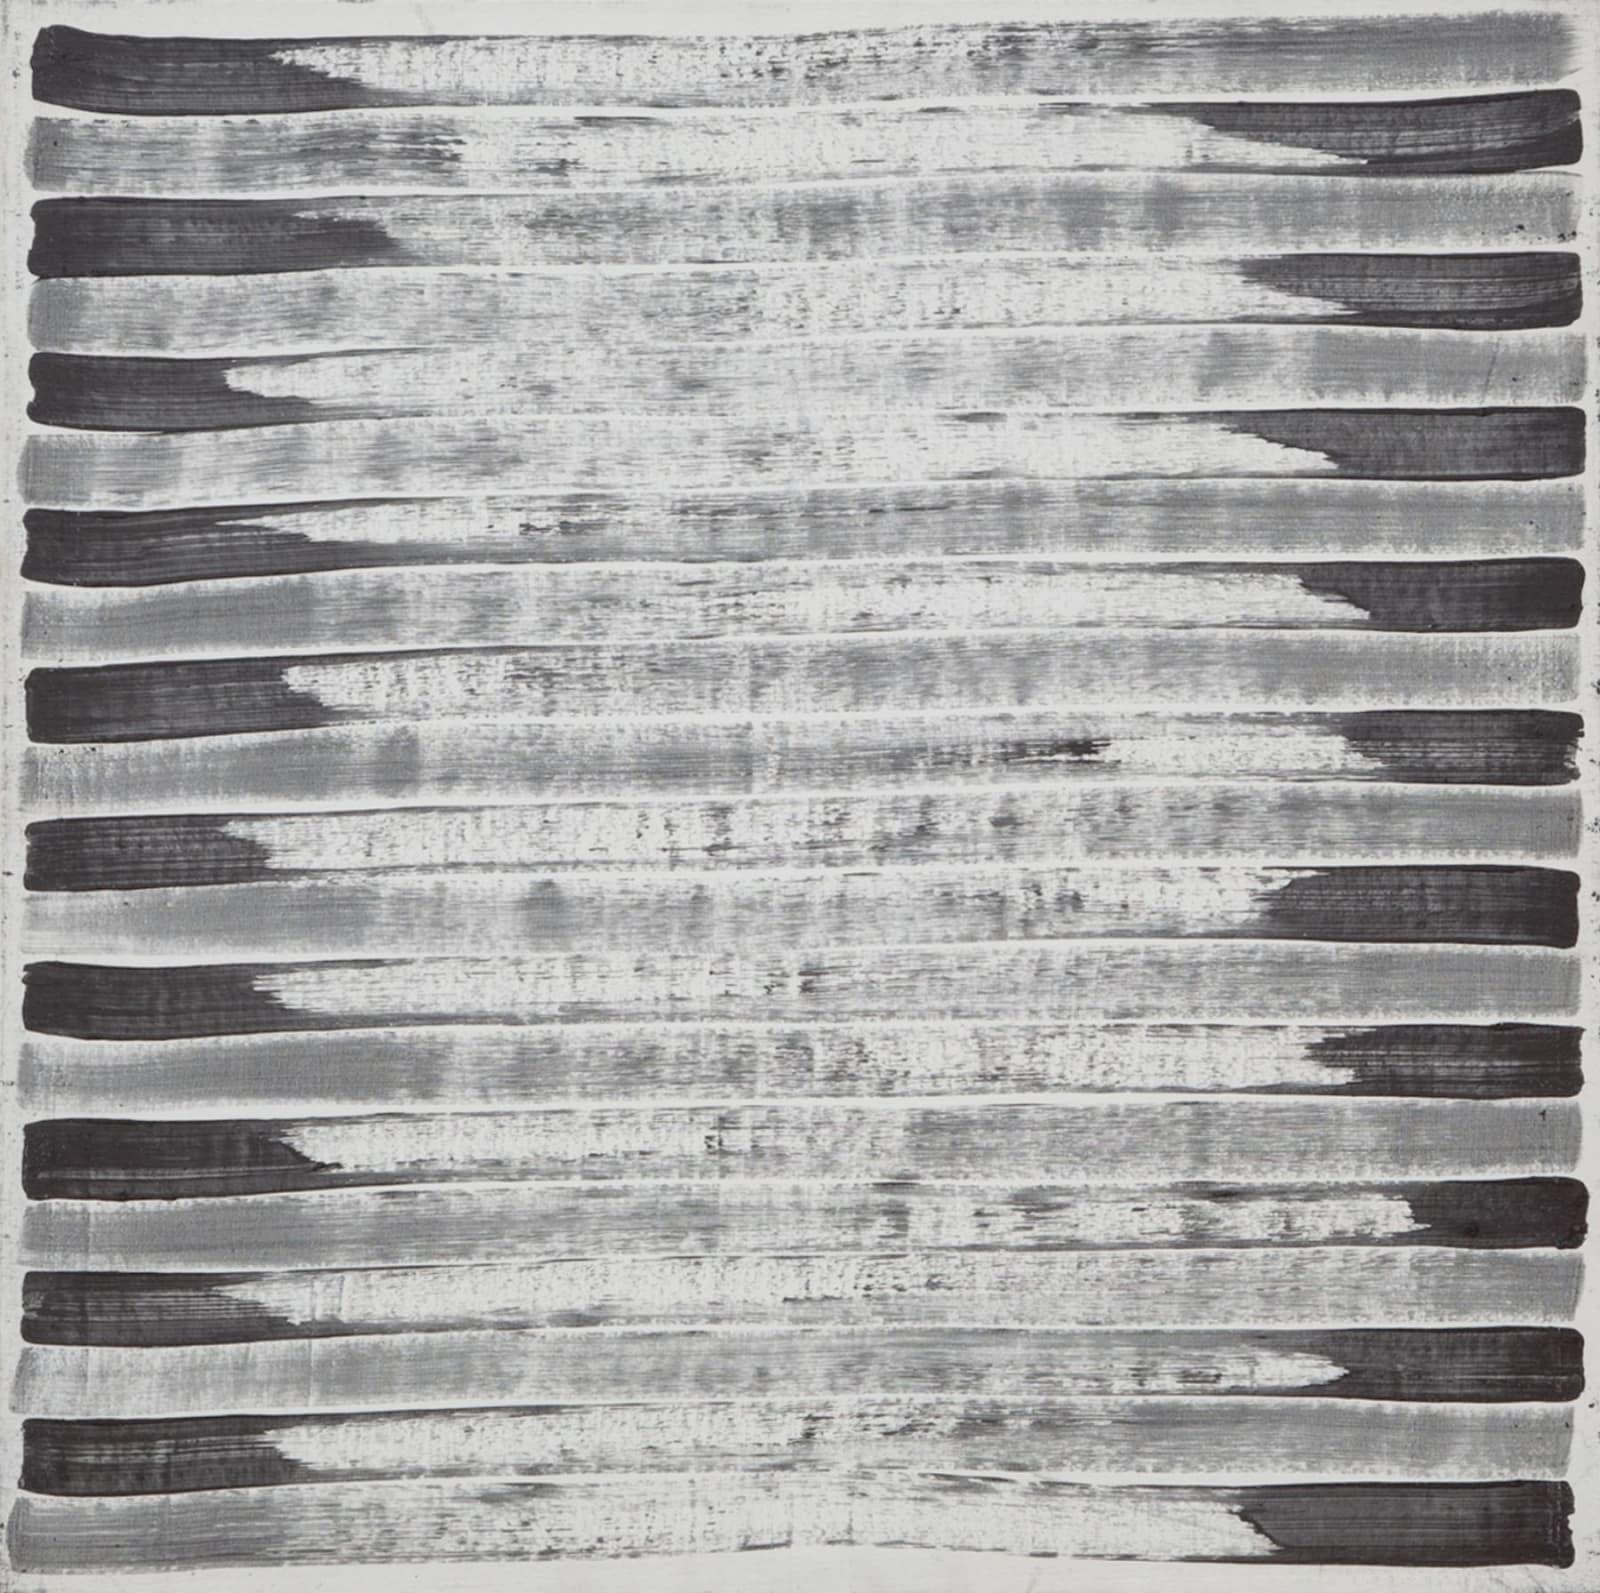 Huguette Caland, Untitled, 1998